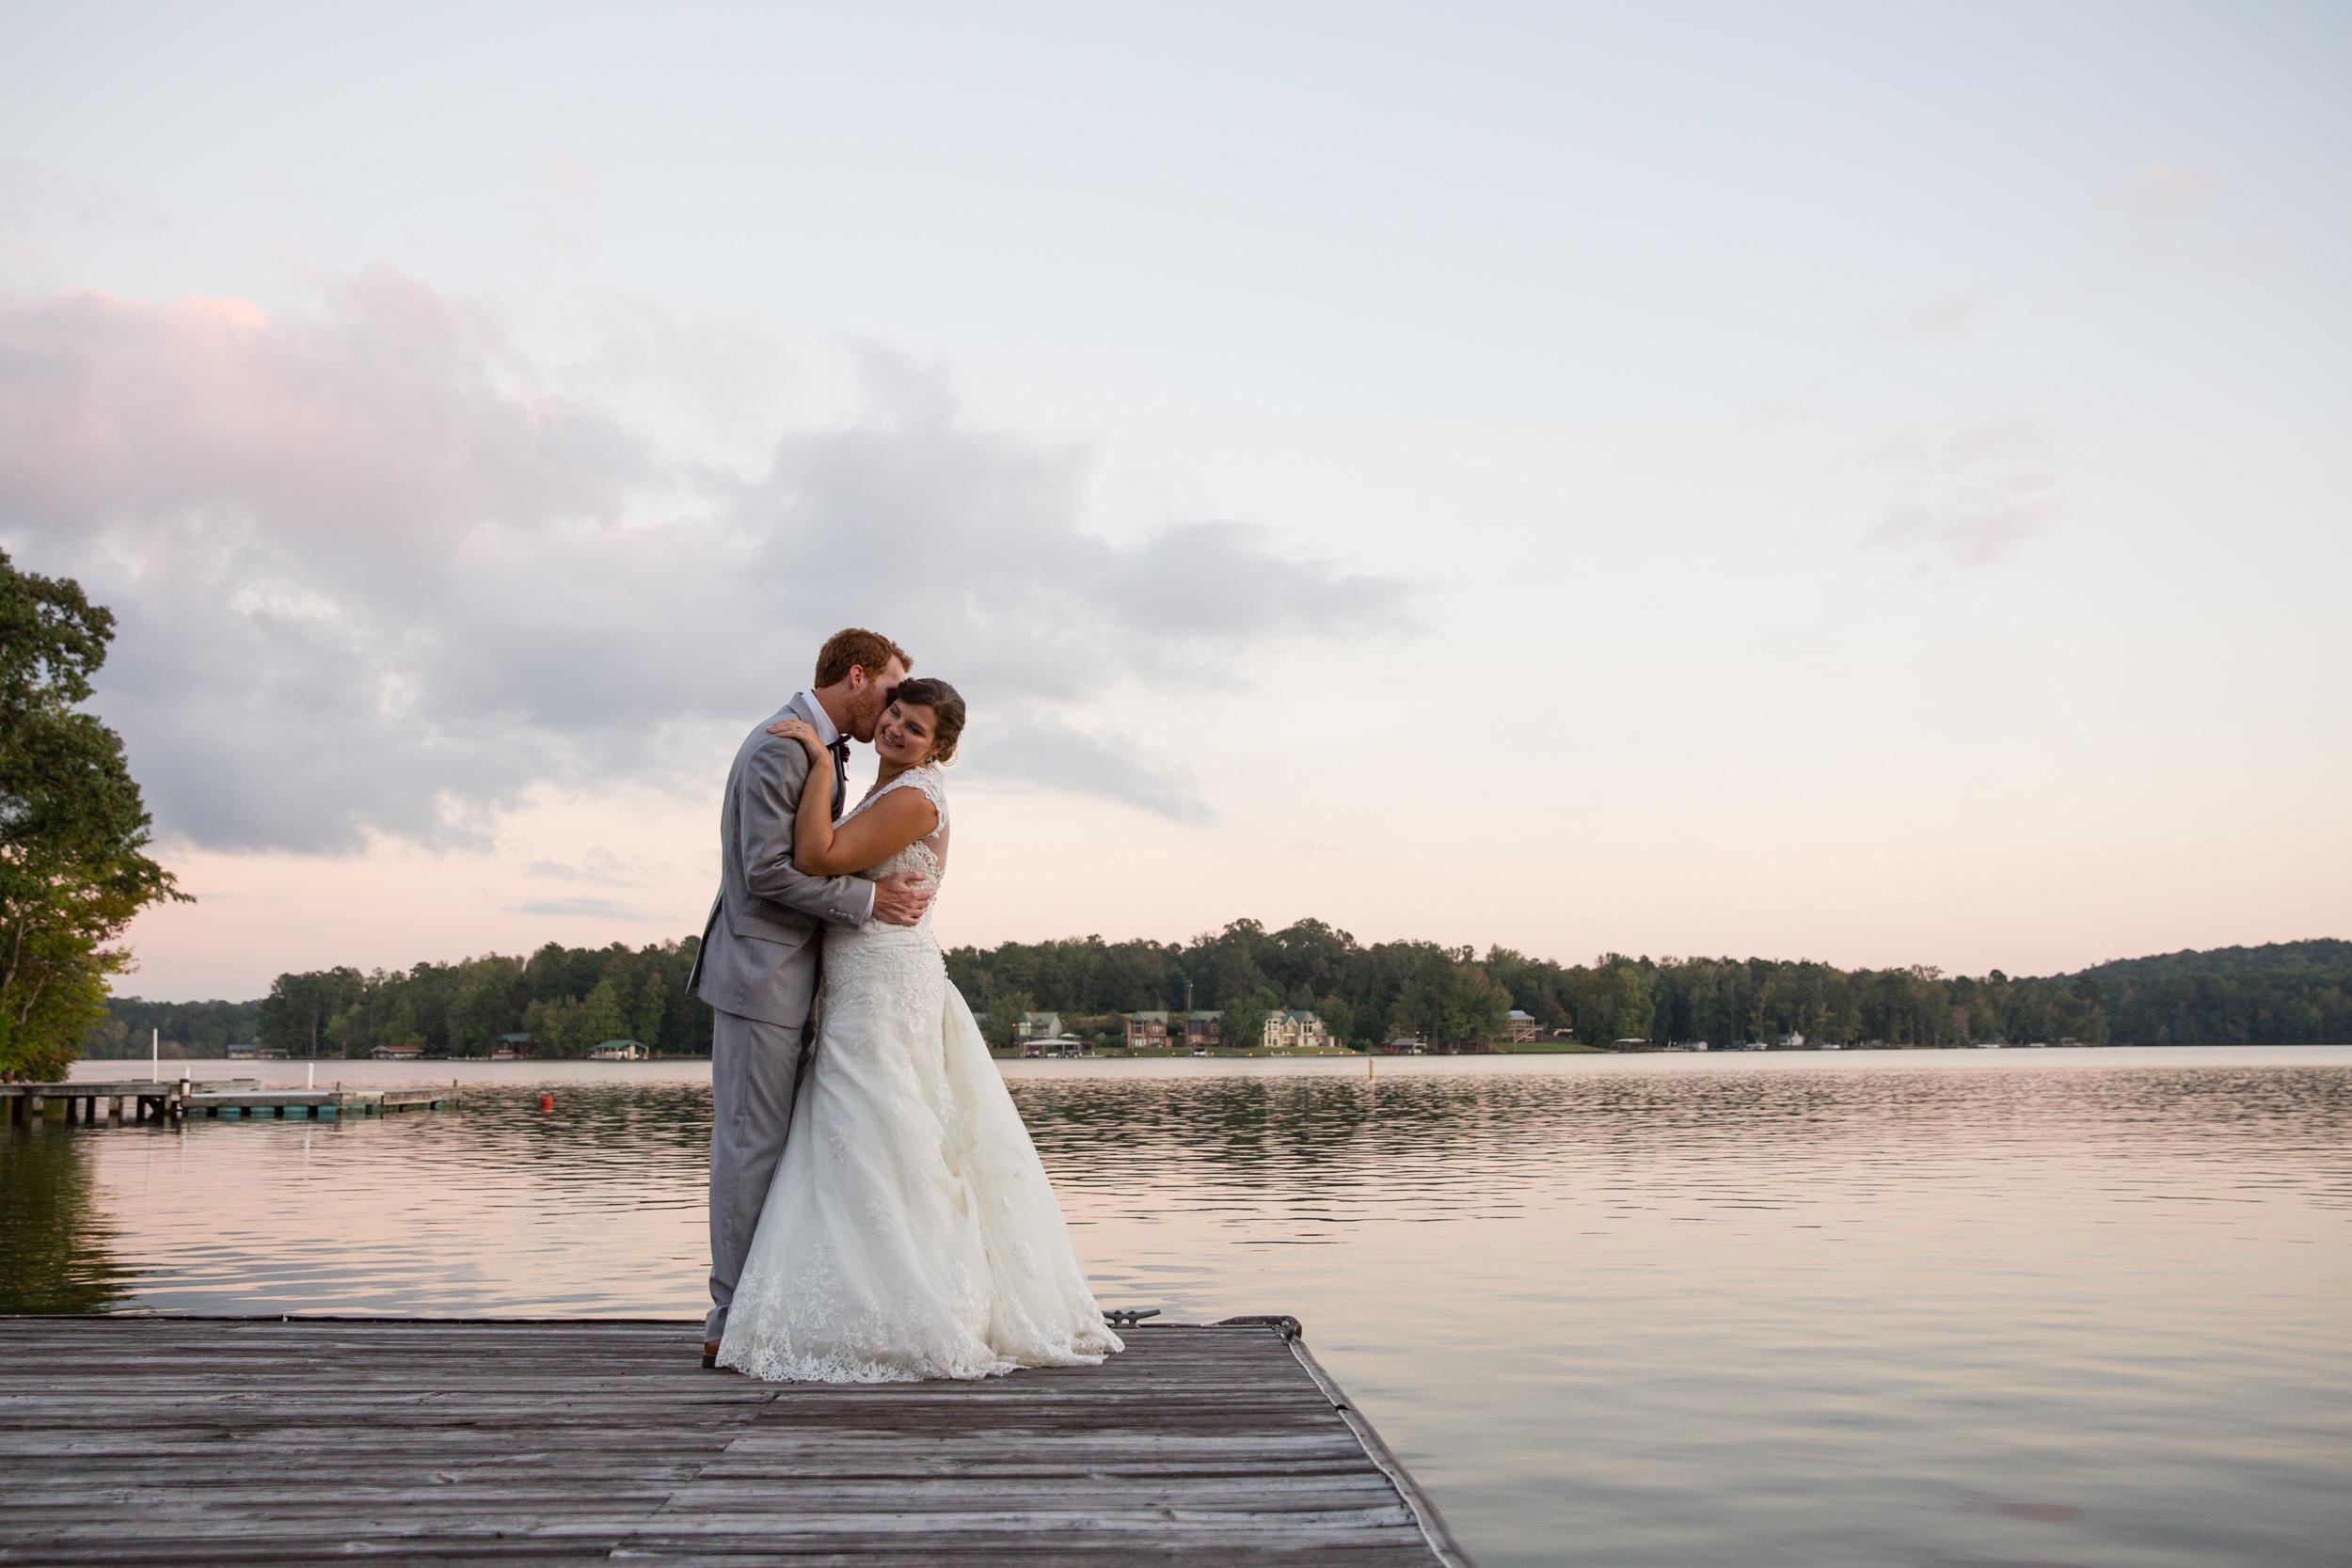 AJB_Wedding_JackieLuke_Blog-26.jpg